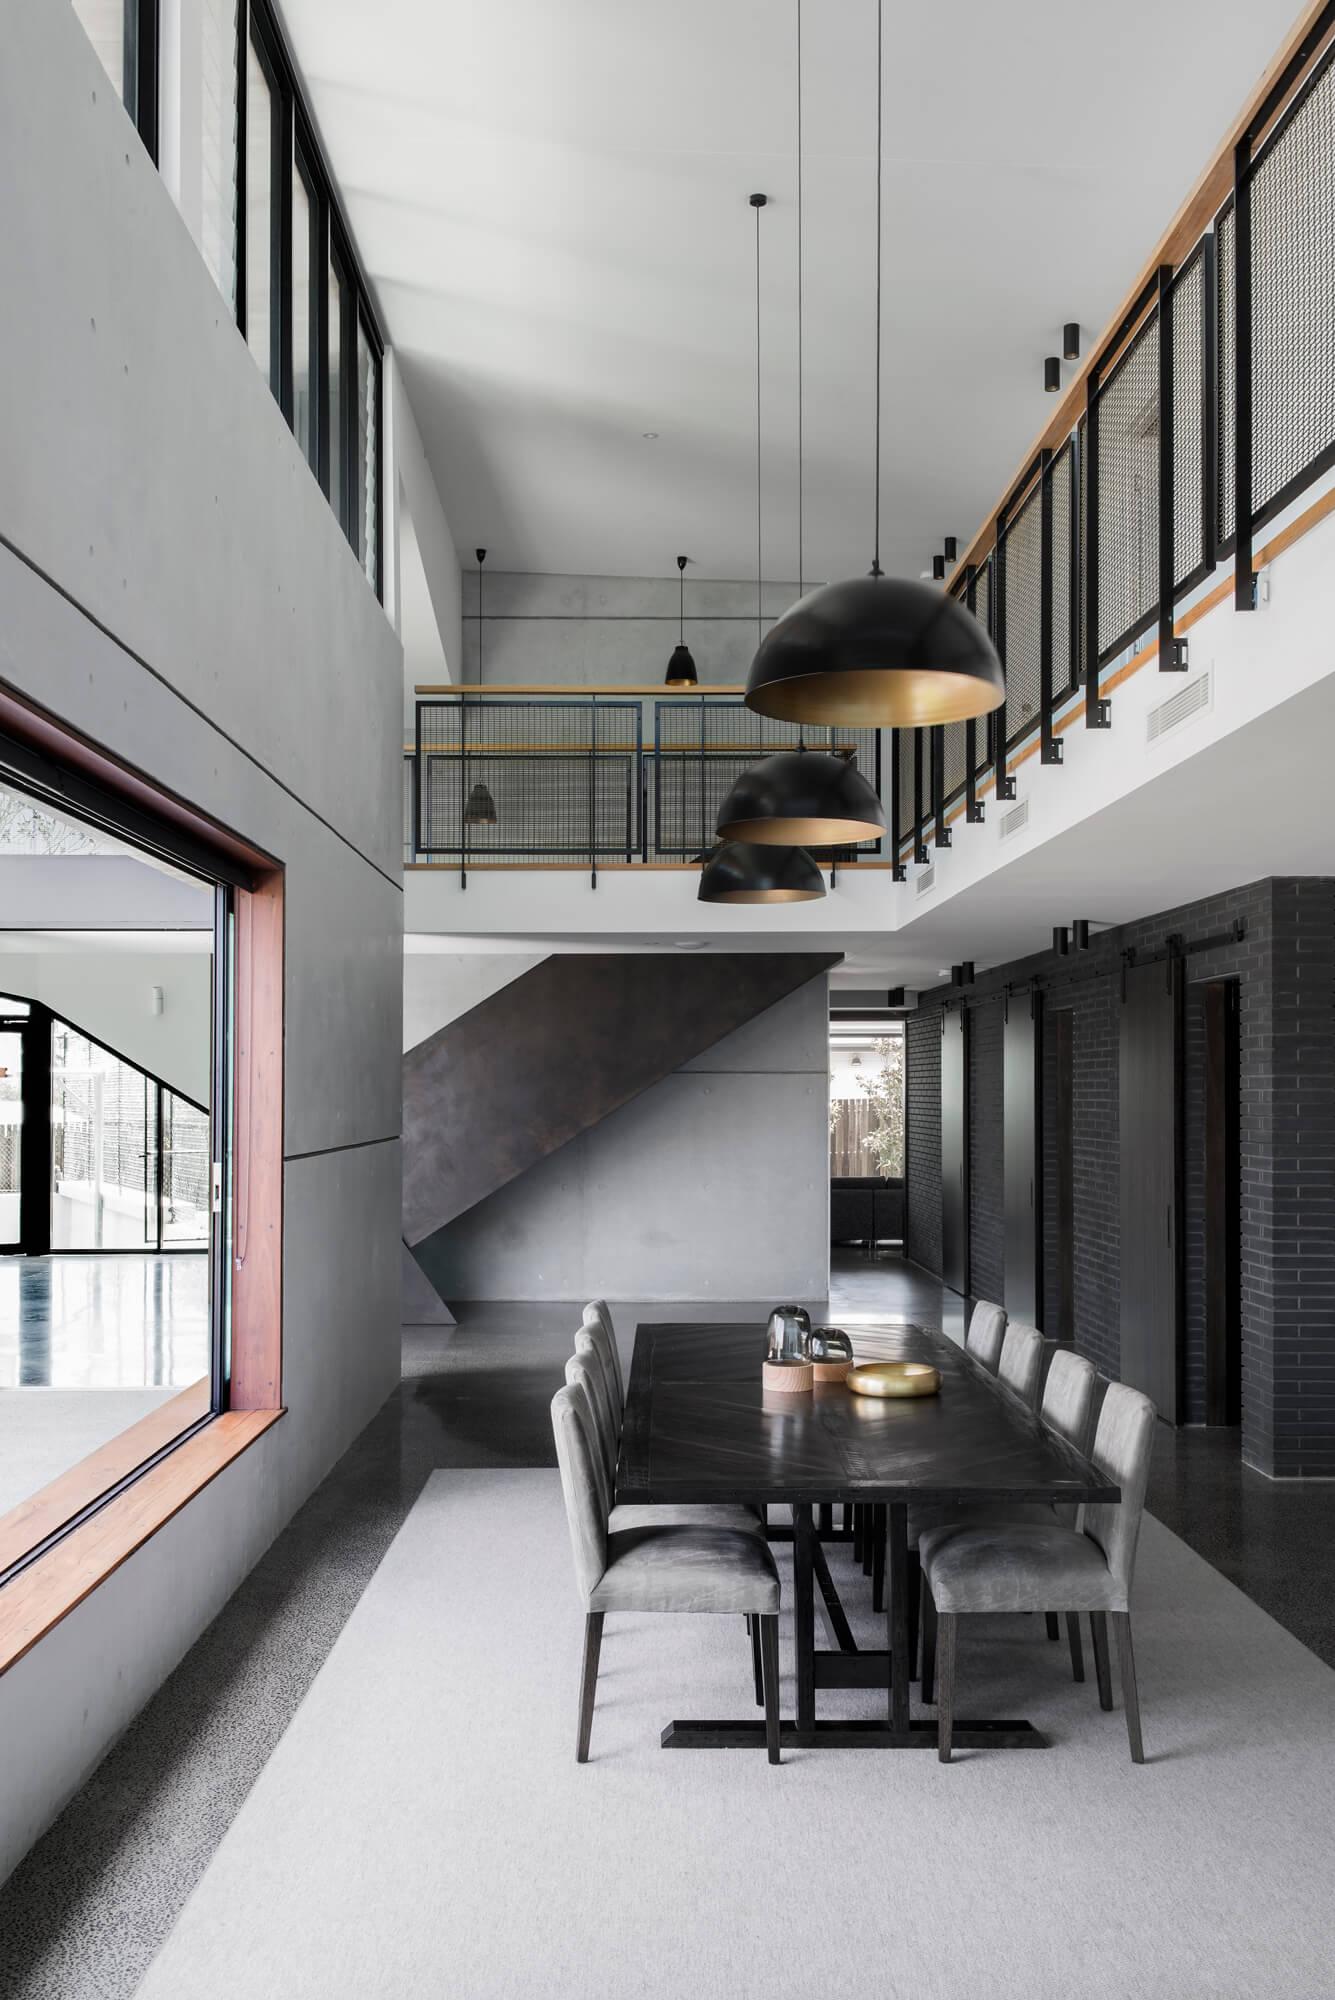 georgia-cannon-interior-designer-brisbane-project-church-house-12.jpg